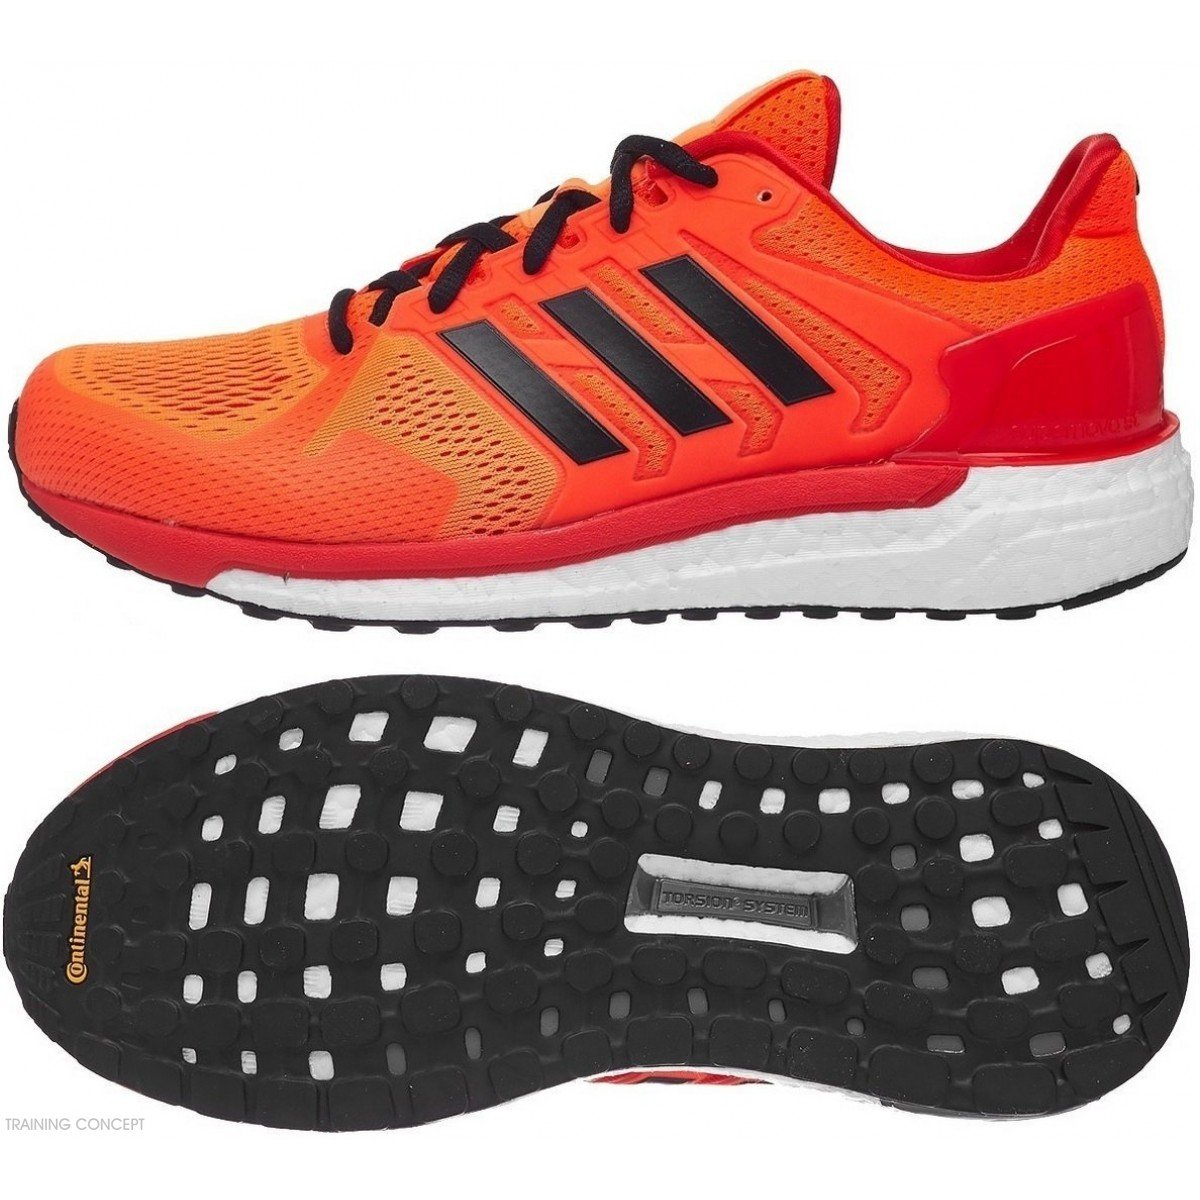 finest selection 429a4 42374 De M Adidas St Supernova Homme Chaussures Running UfSqwH0